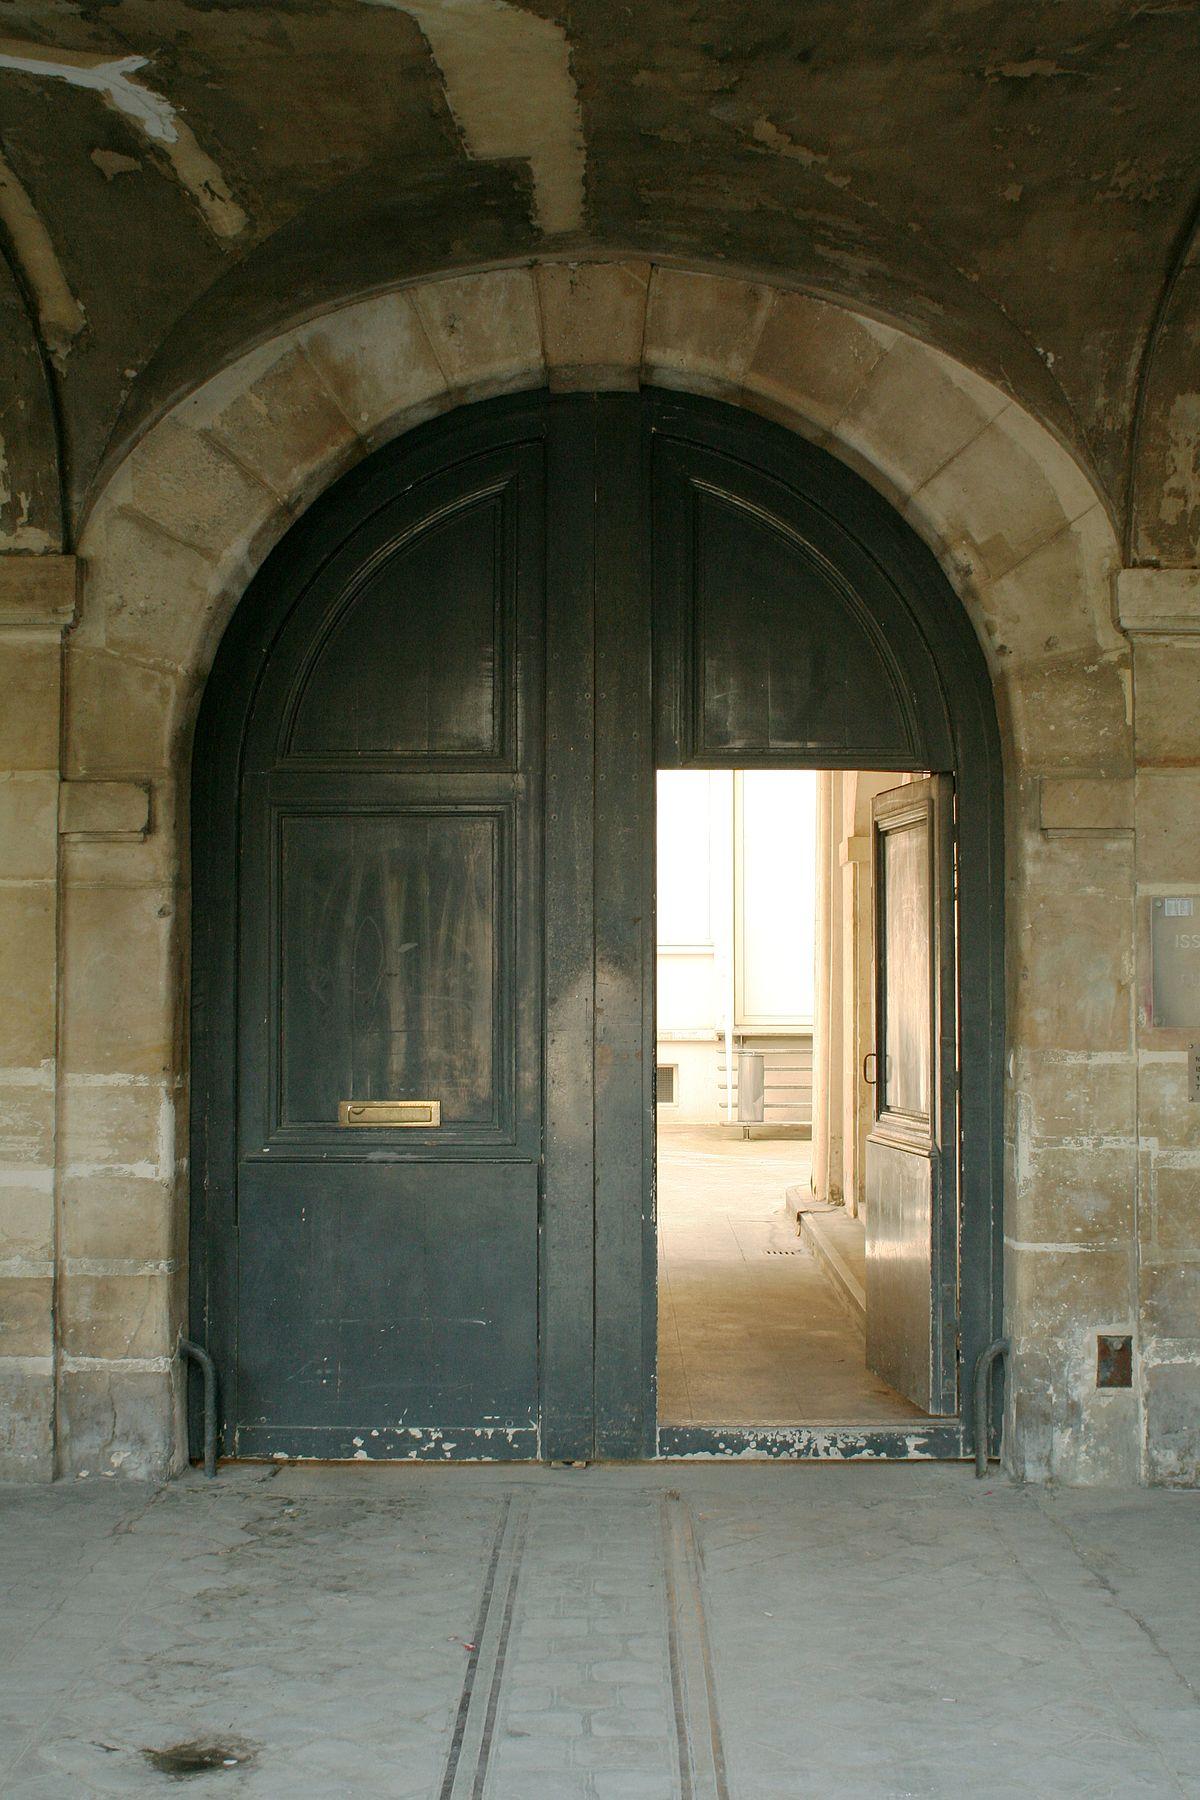 Guichet wiktionnaire for Etymologie architecture